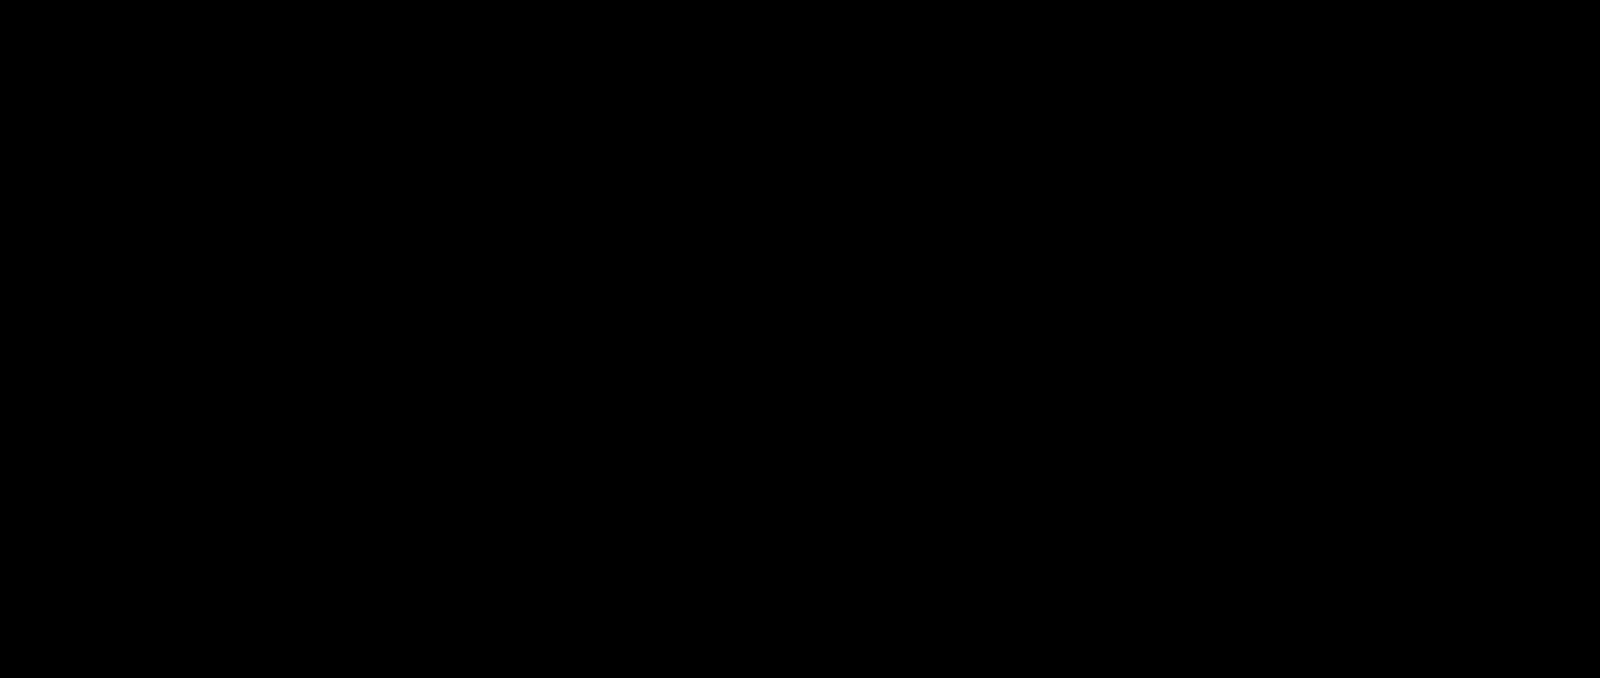 Pentagrama Musical Escala Related Keywords - Pentagrama